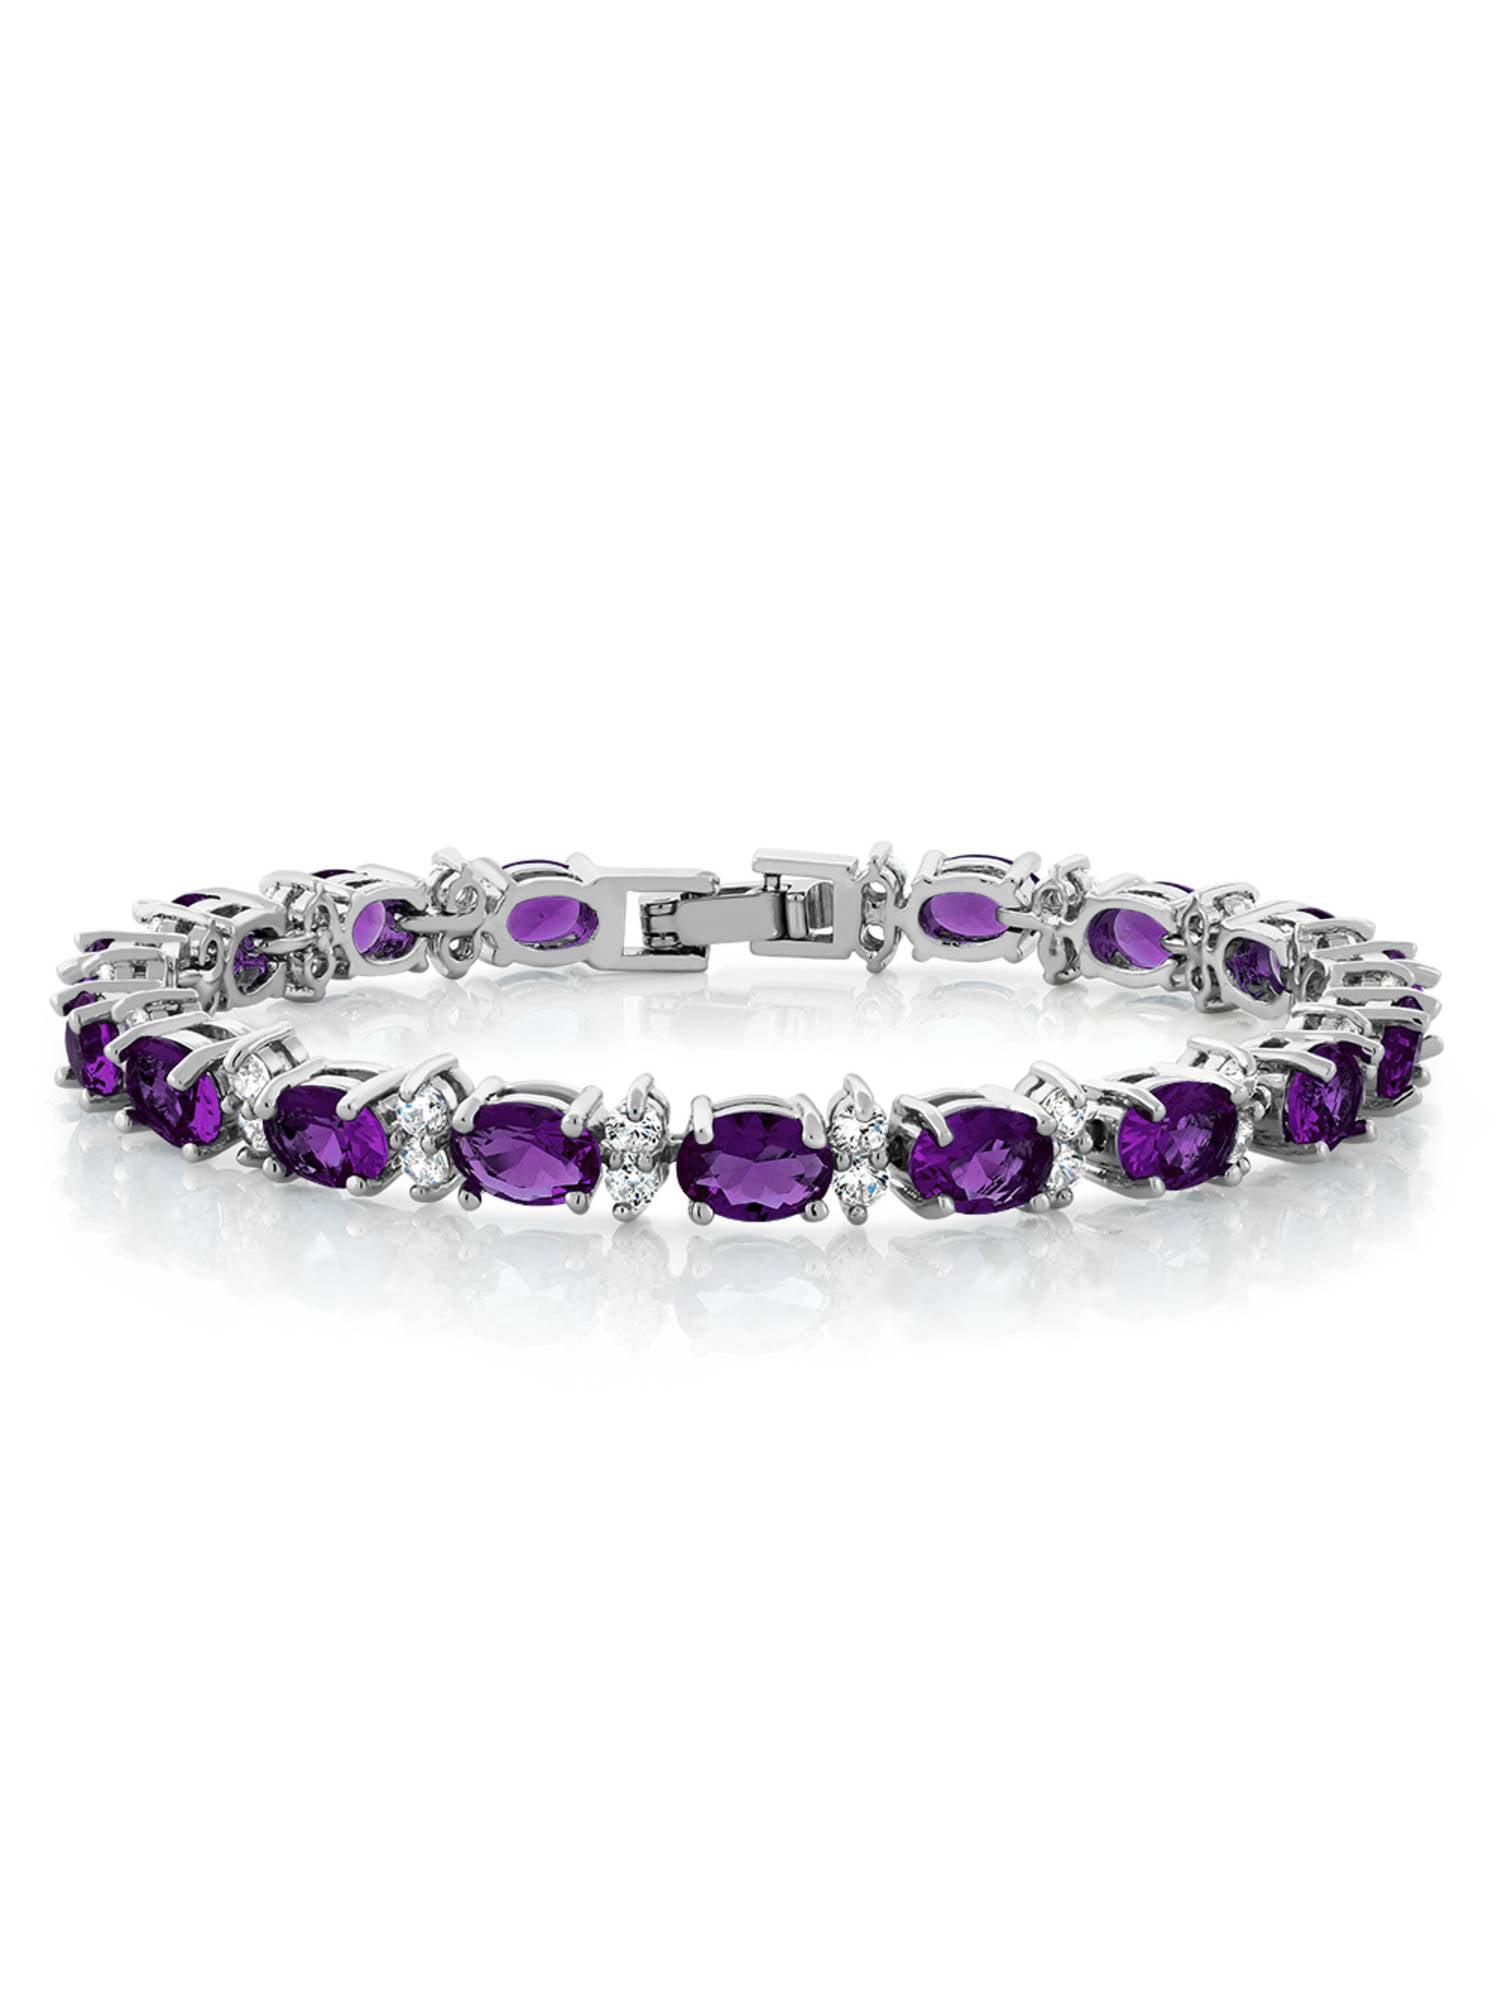 Gem Stone King 9.20 Ct Oval Purple Amethyst 18K Yellow Gold Plated Silver Bracelet